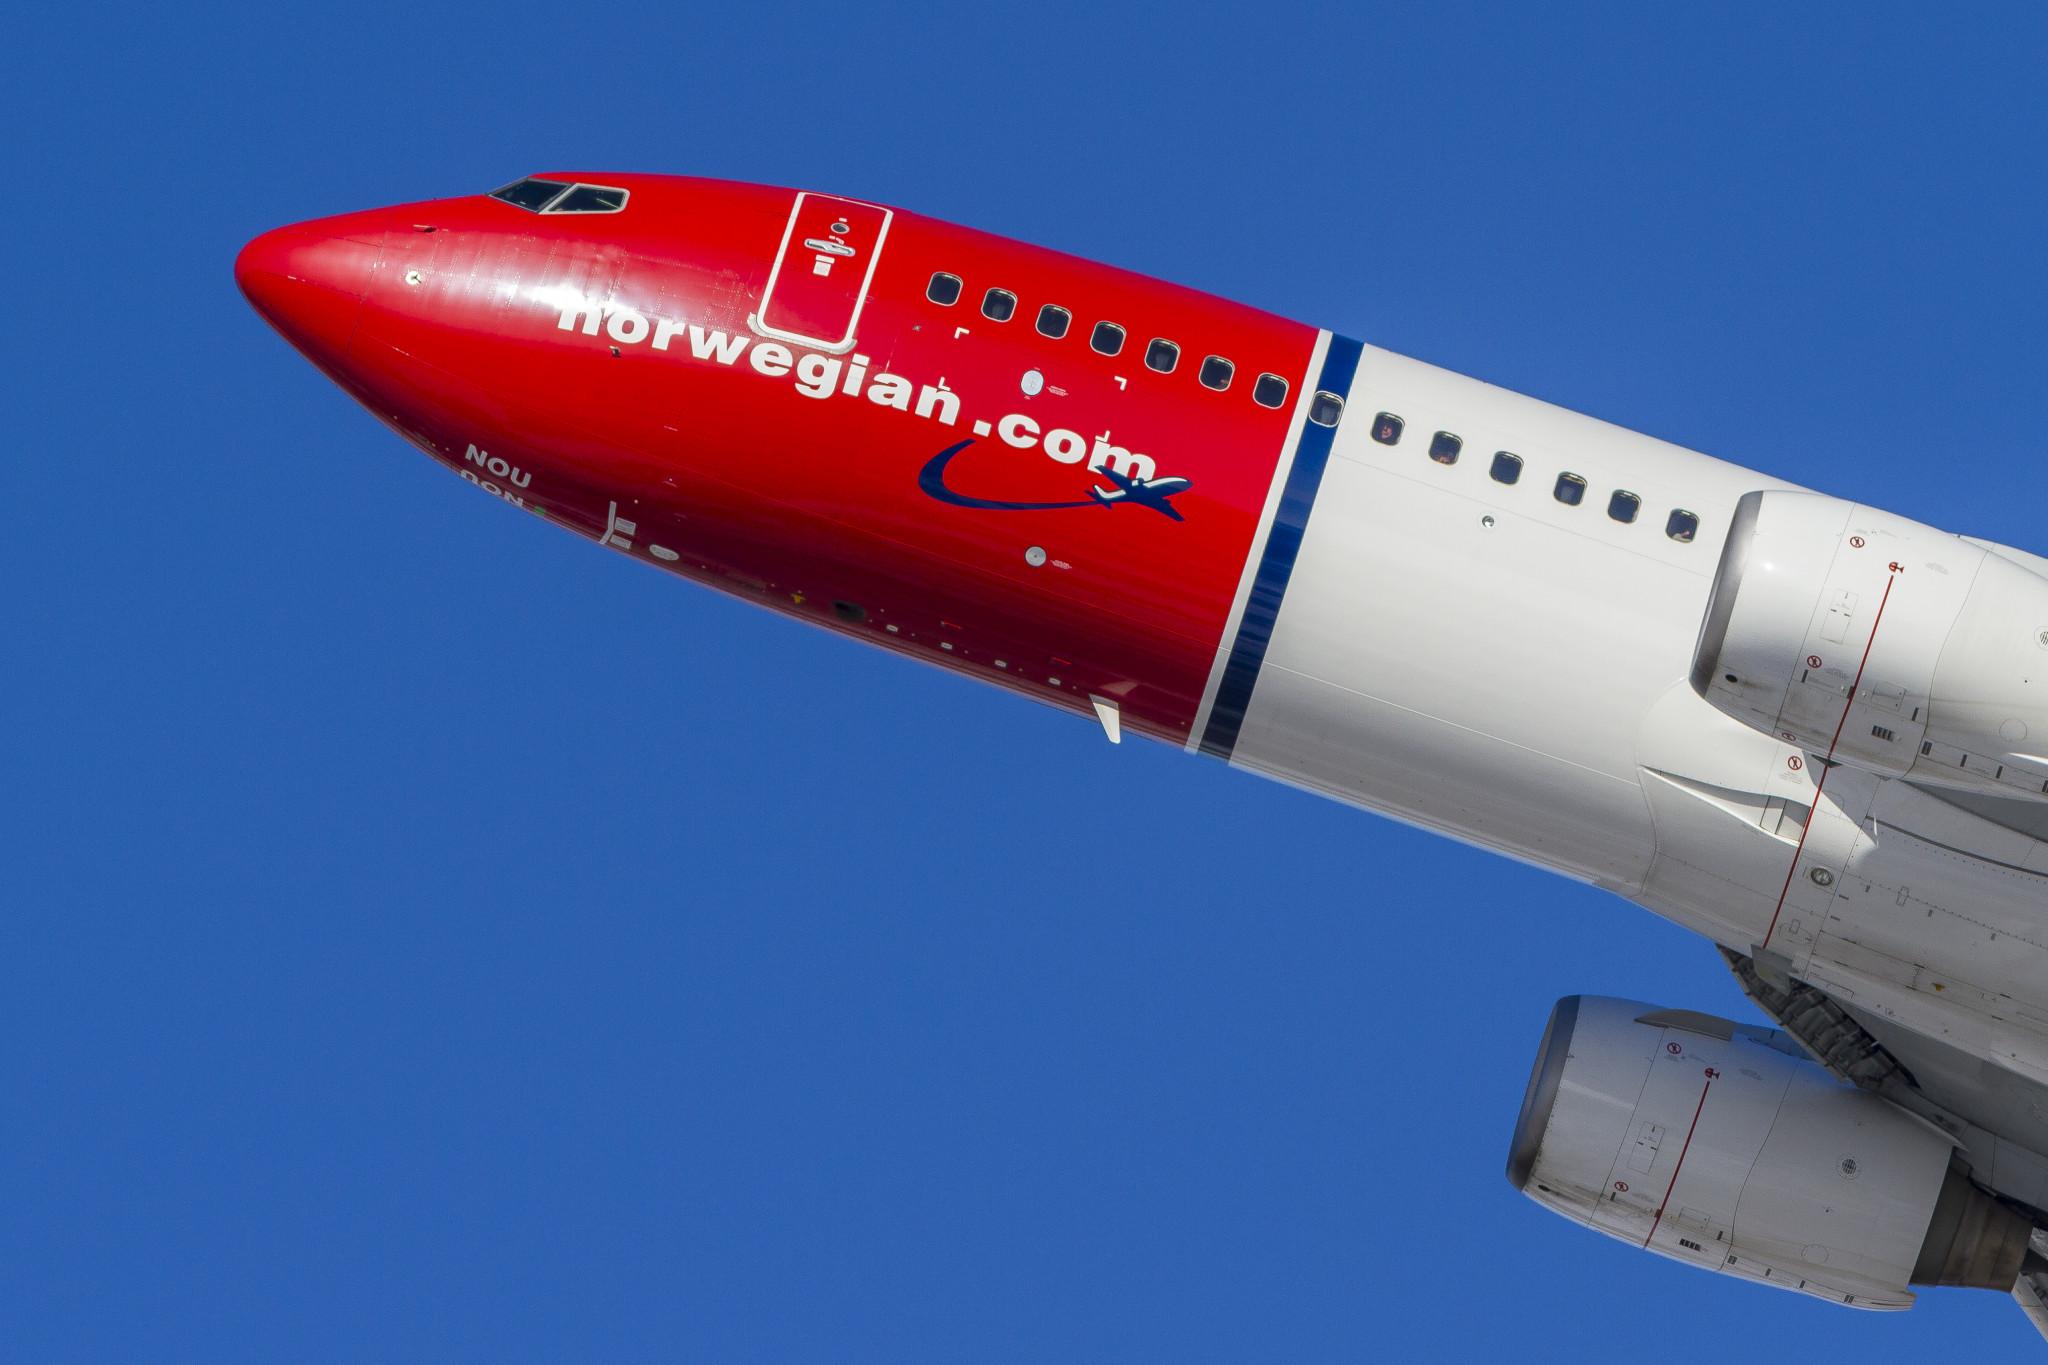 Norwegian Air Shuttle ASA